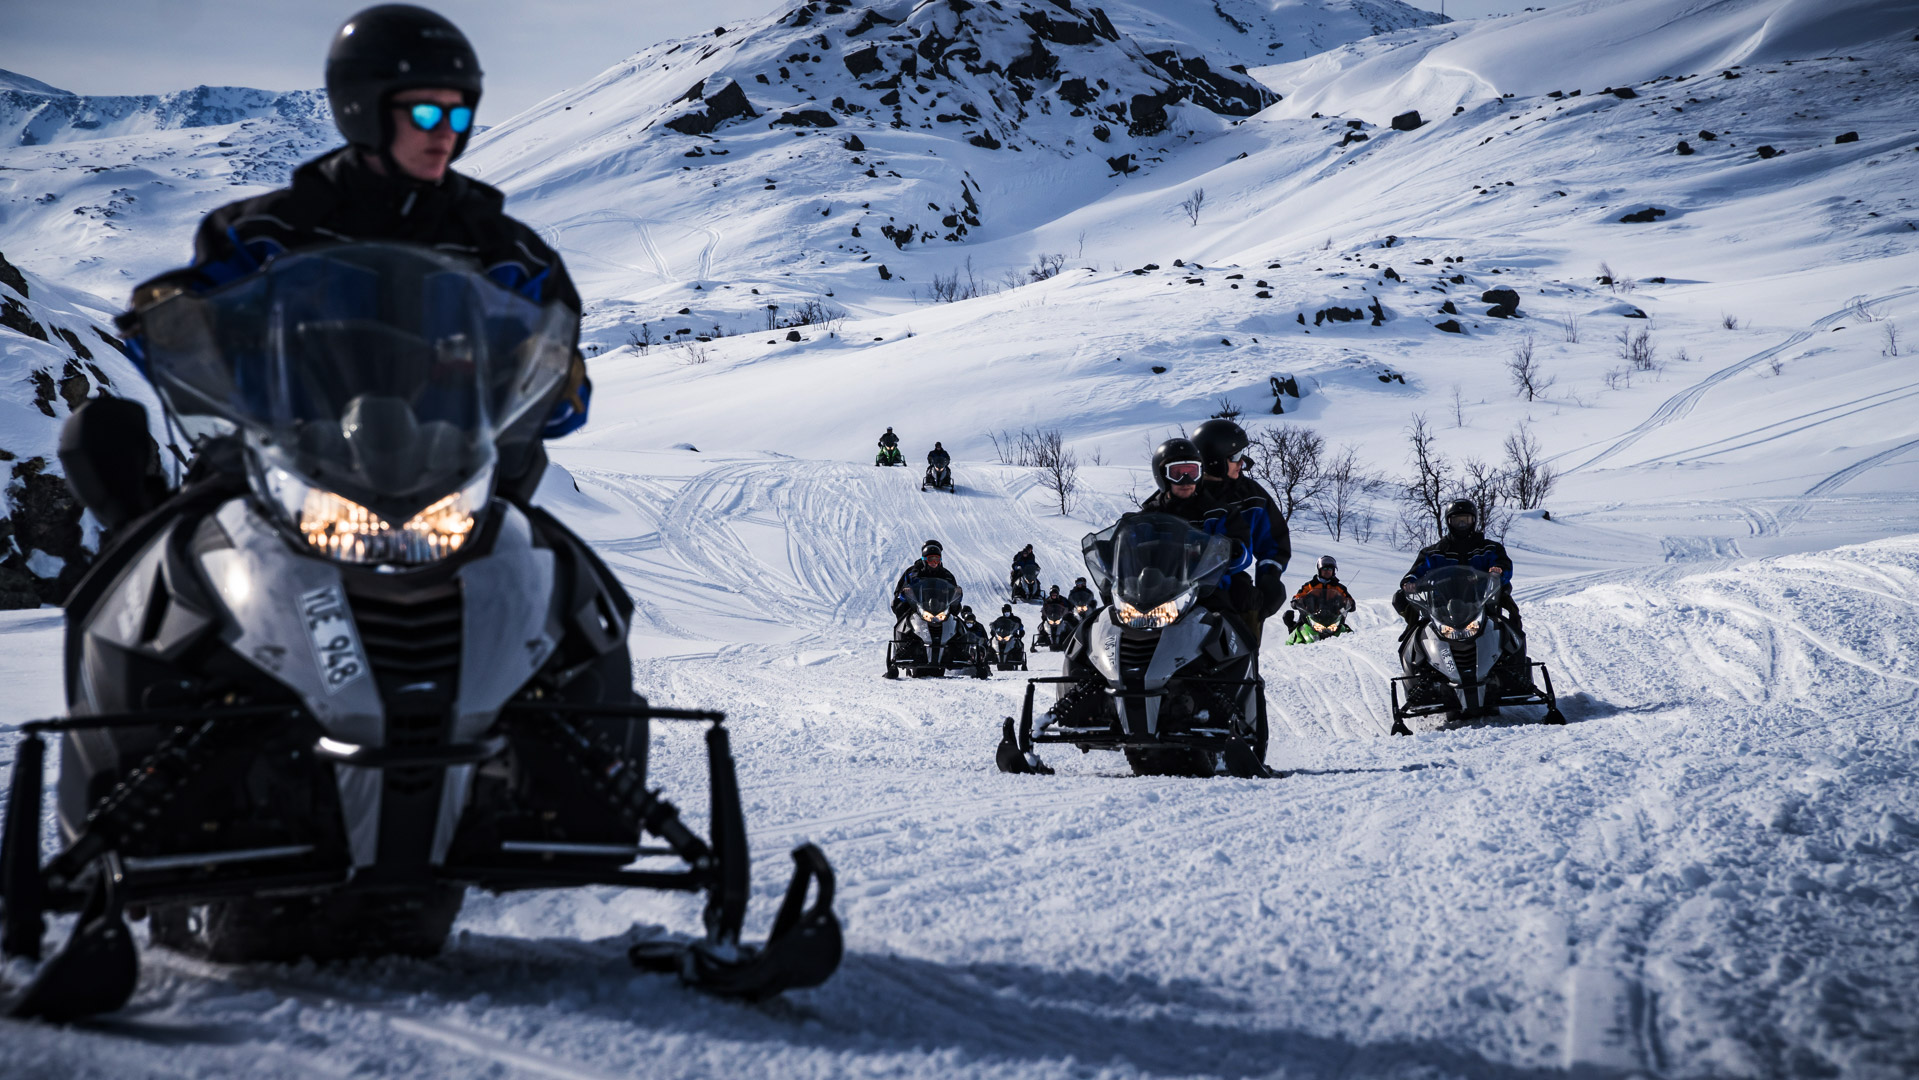 Snow-mobile safari lapland sweden